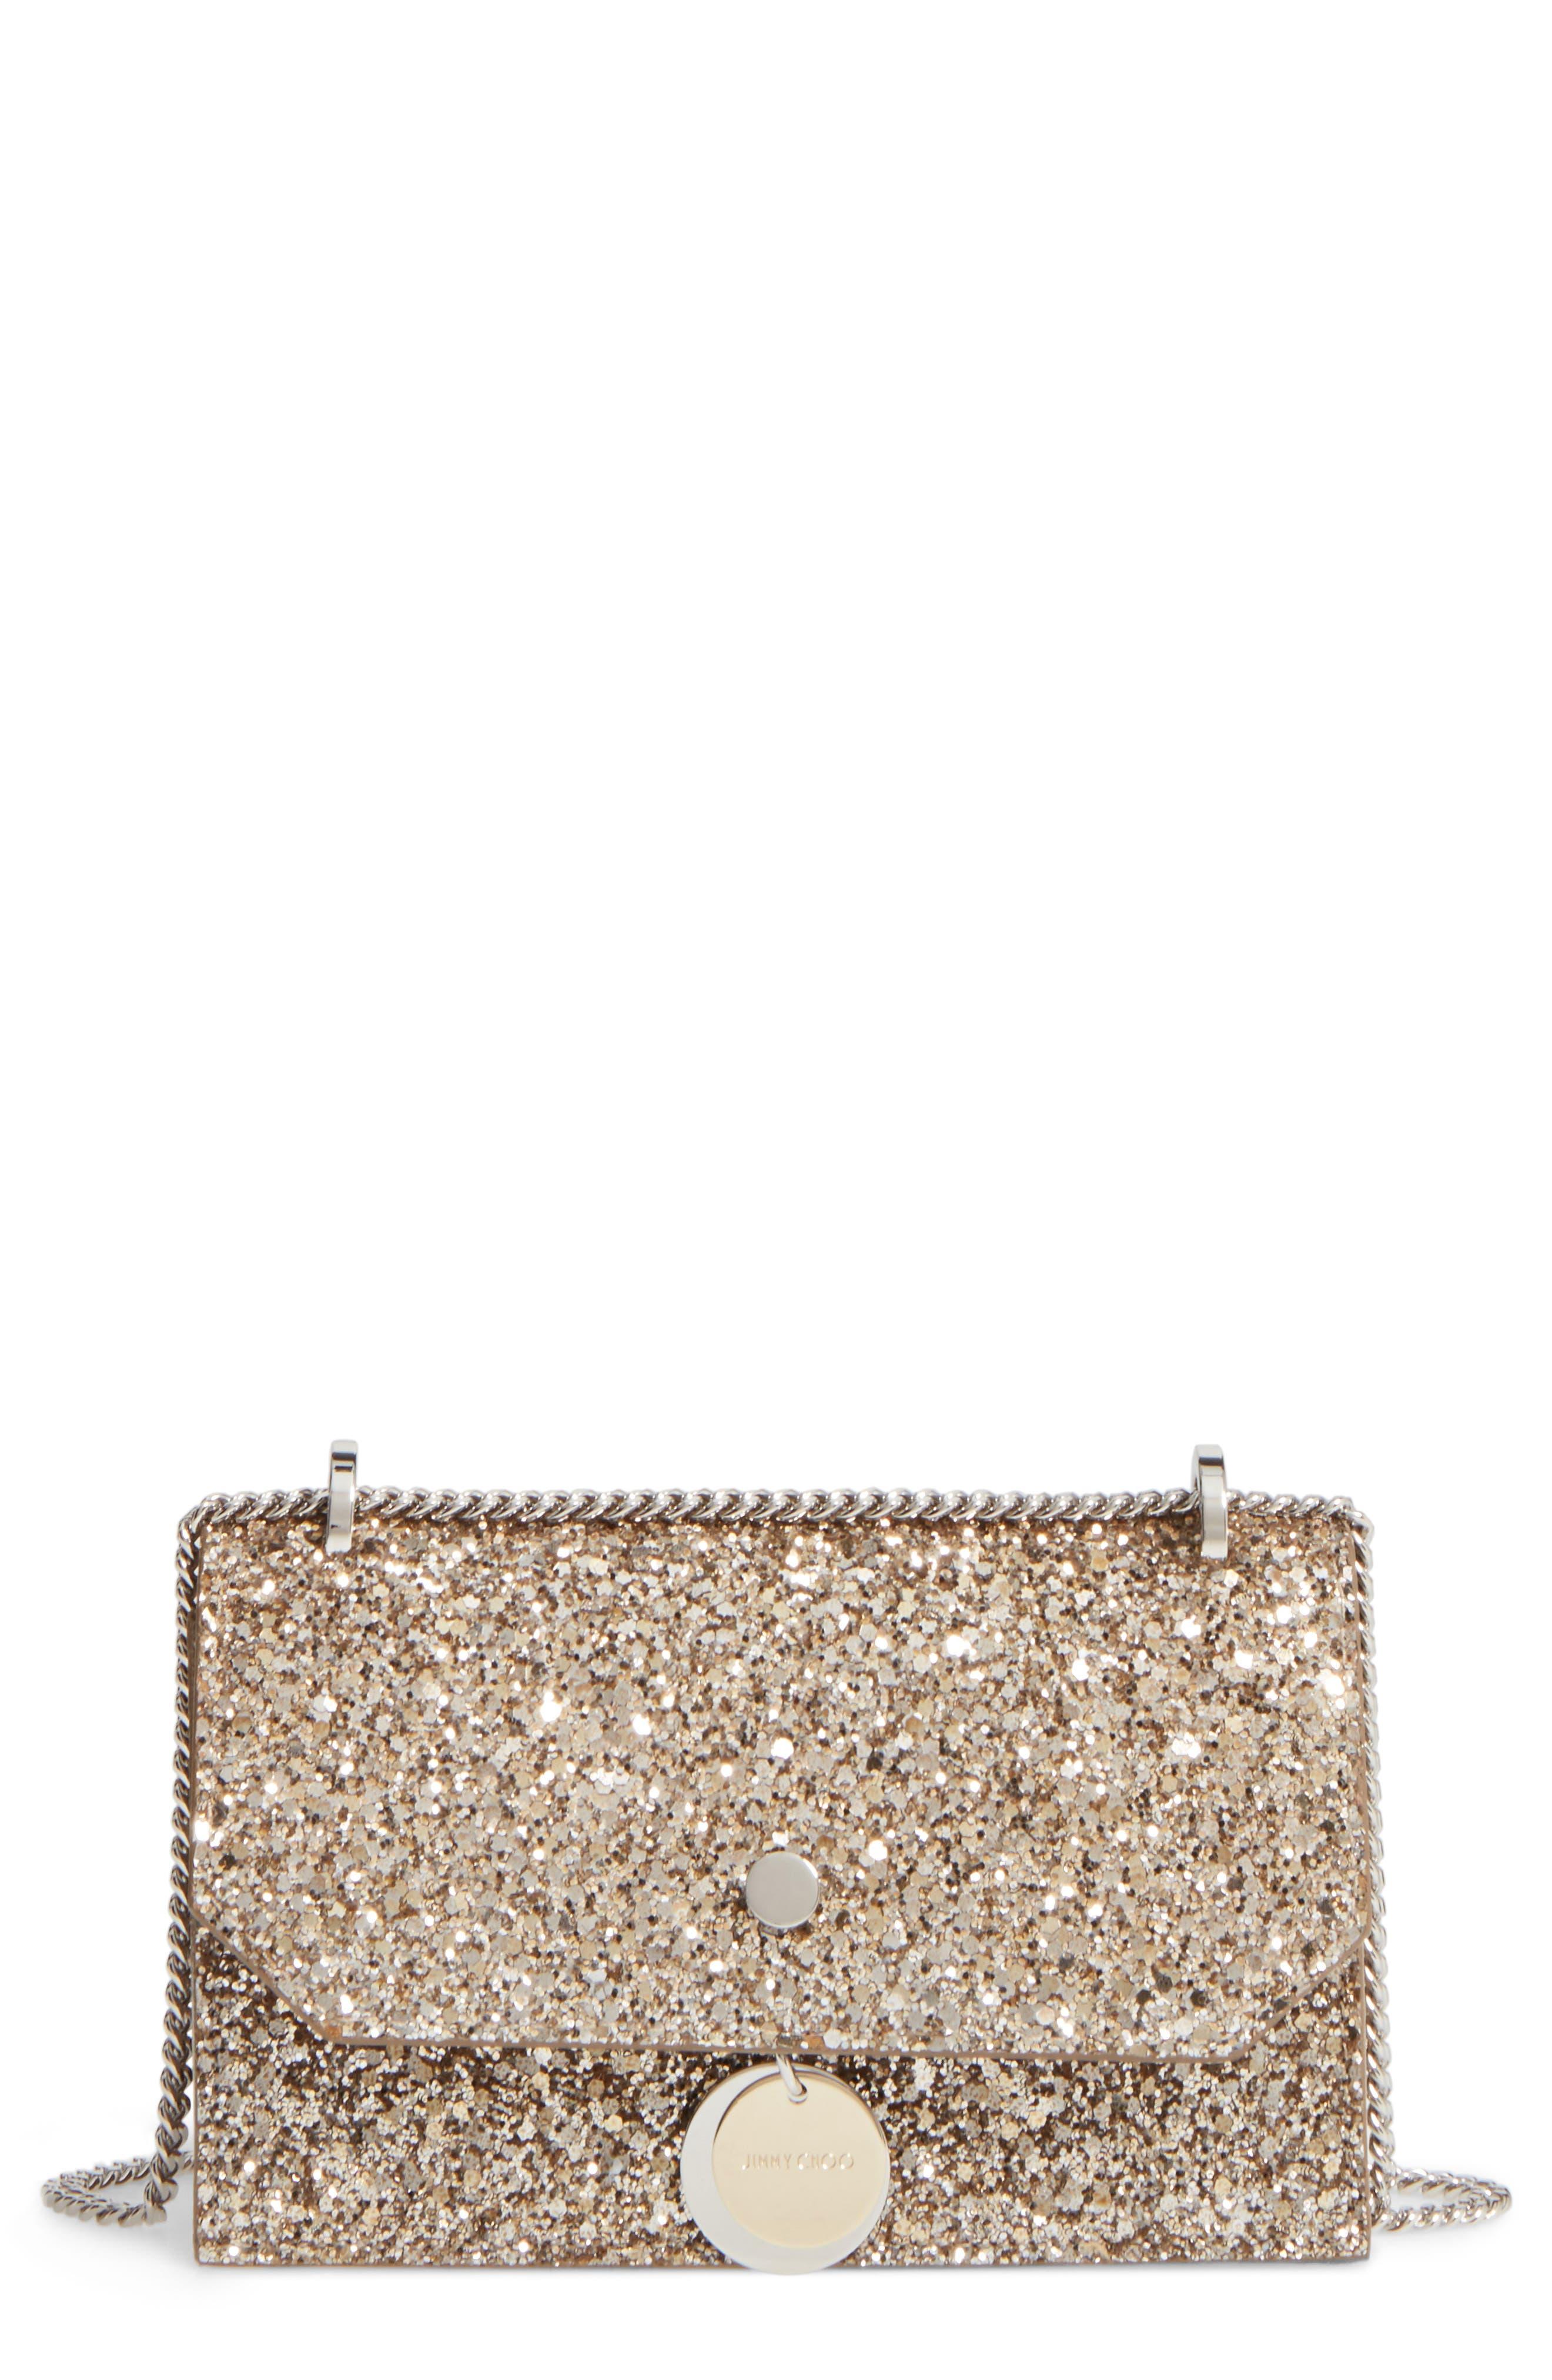 Finley Shadow Glitter Shoulder Bag,                         Main,                         color, 710